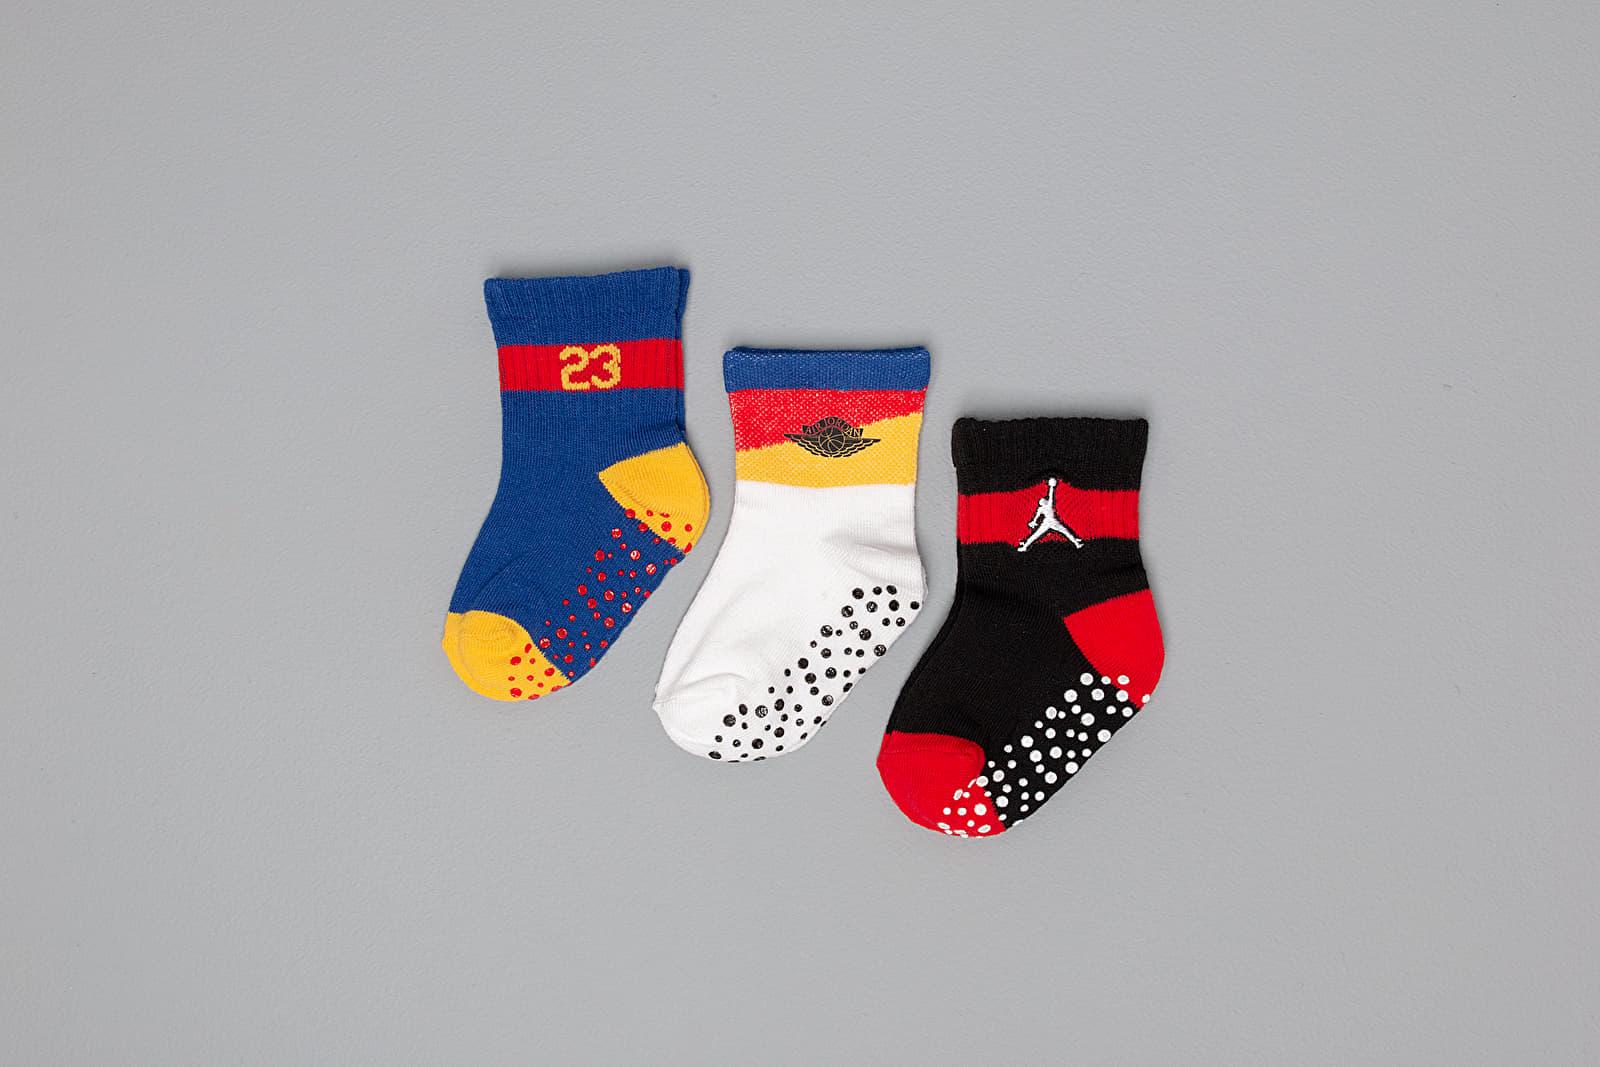 Socks Jordan 23 Pair Socks Multicolor